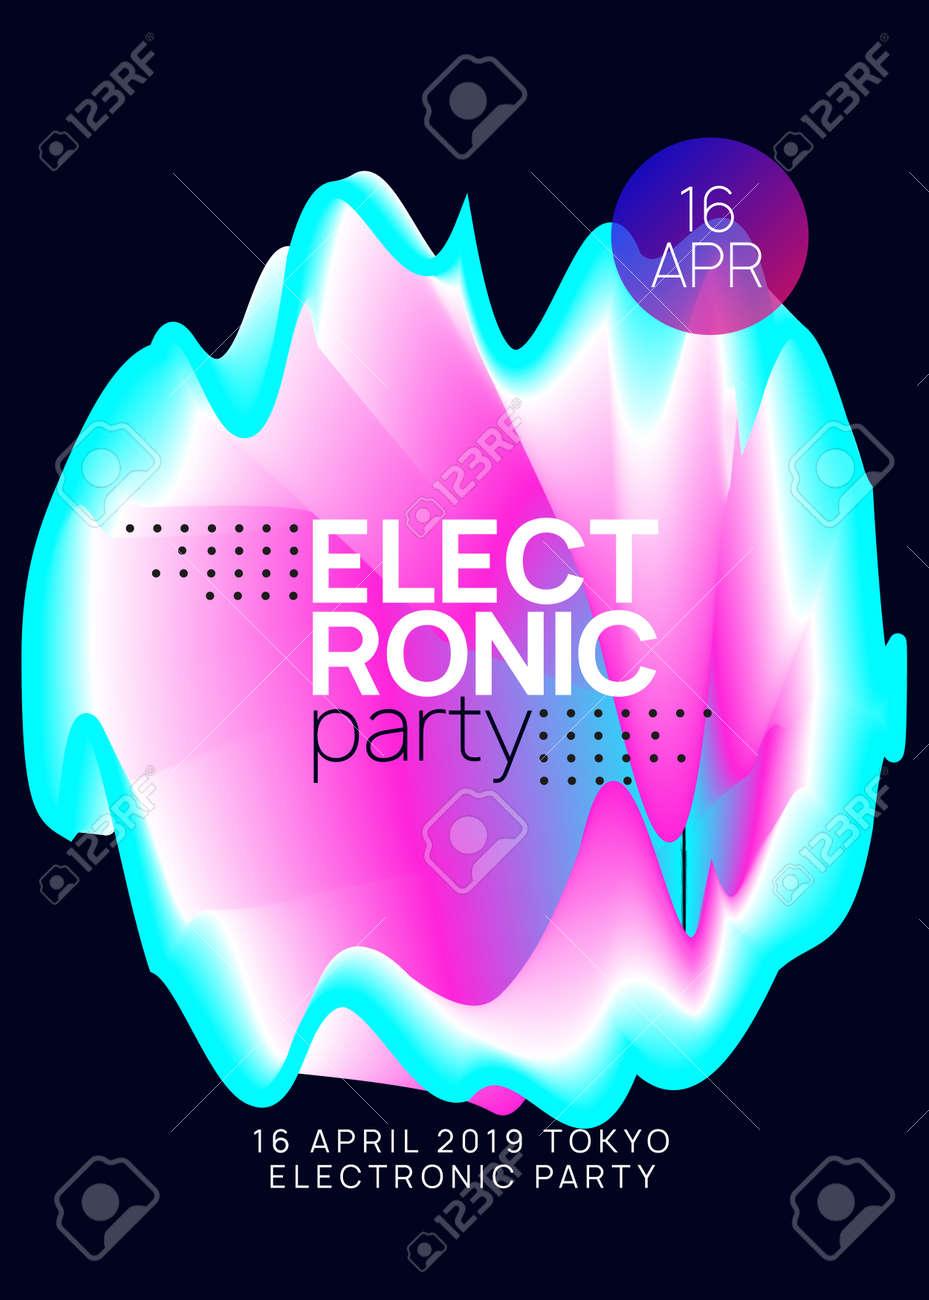 Summer music  Electronic sound  Night dance lifestyle holiday